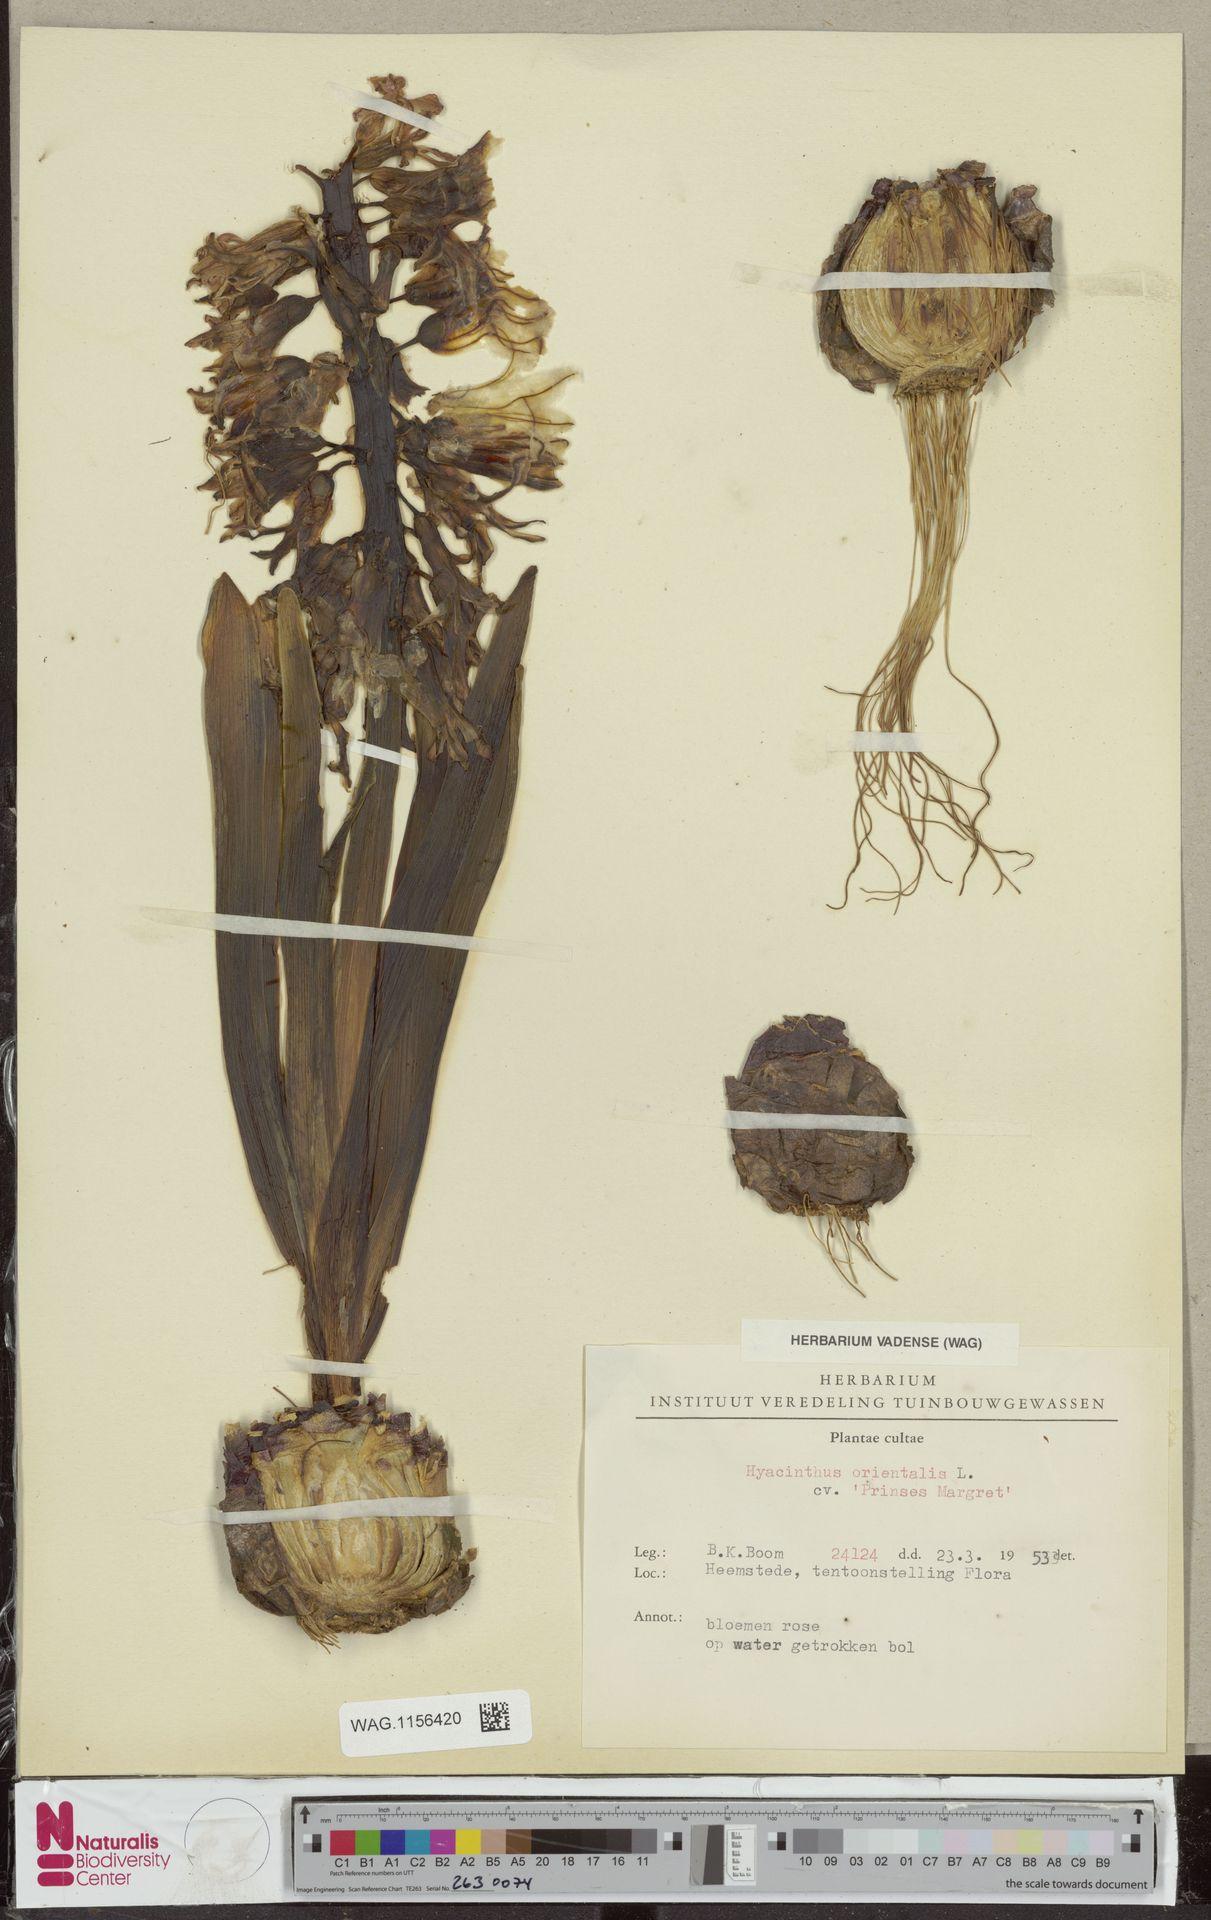 WAG.1156420 | Hyacinthus orientalis cv. 'Prinses Margret'